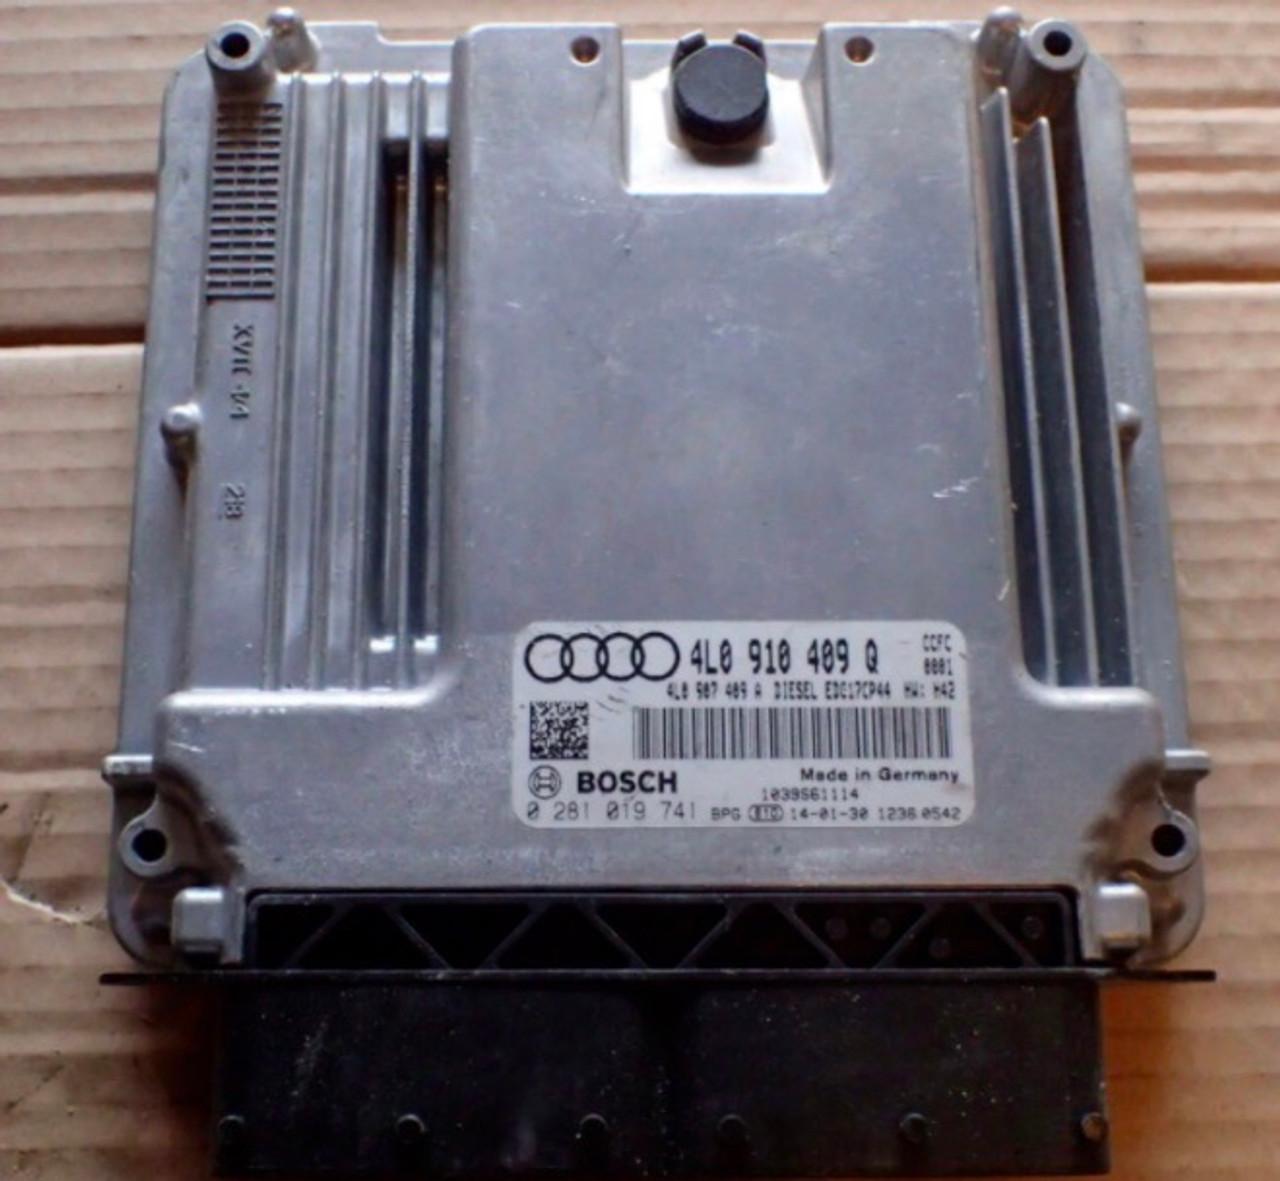 Bosch Engine ECU, Audi, 0281019741, 0 281 019 741, 4L0910409Q, 4L0 910 409 Q, 1039S61114